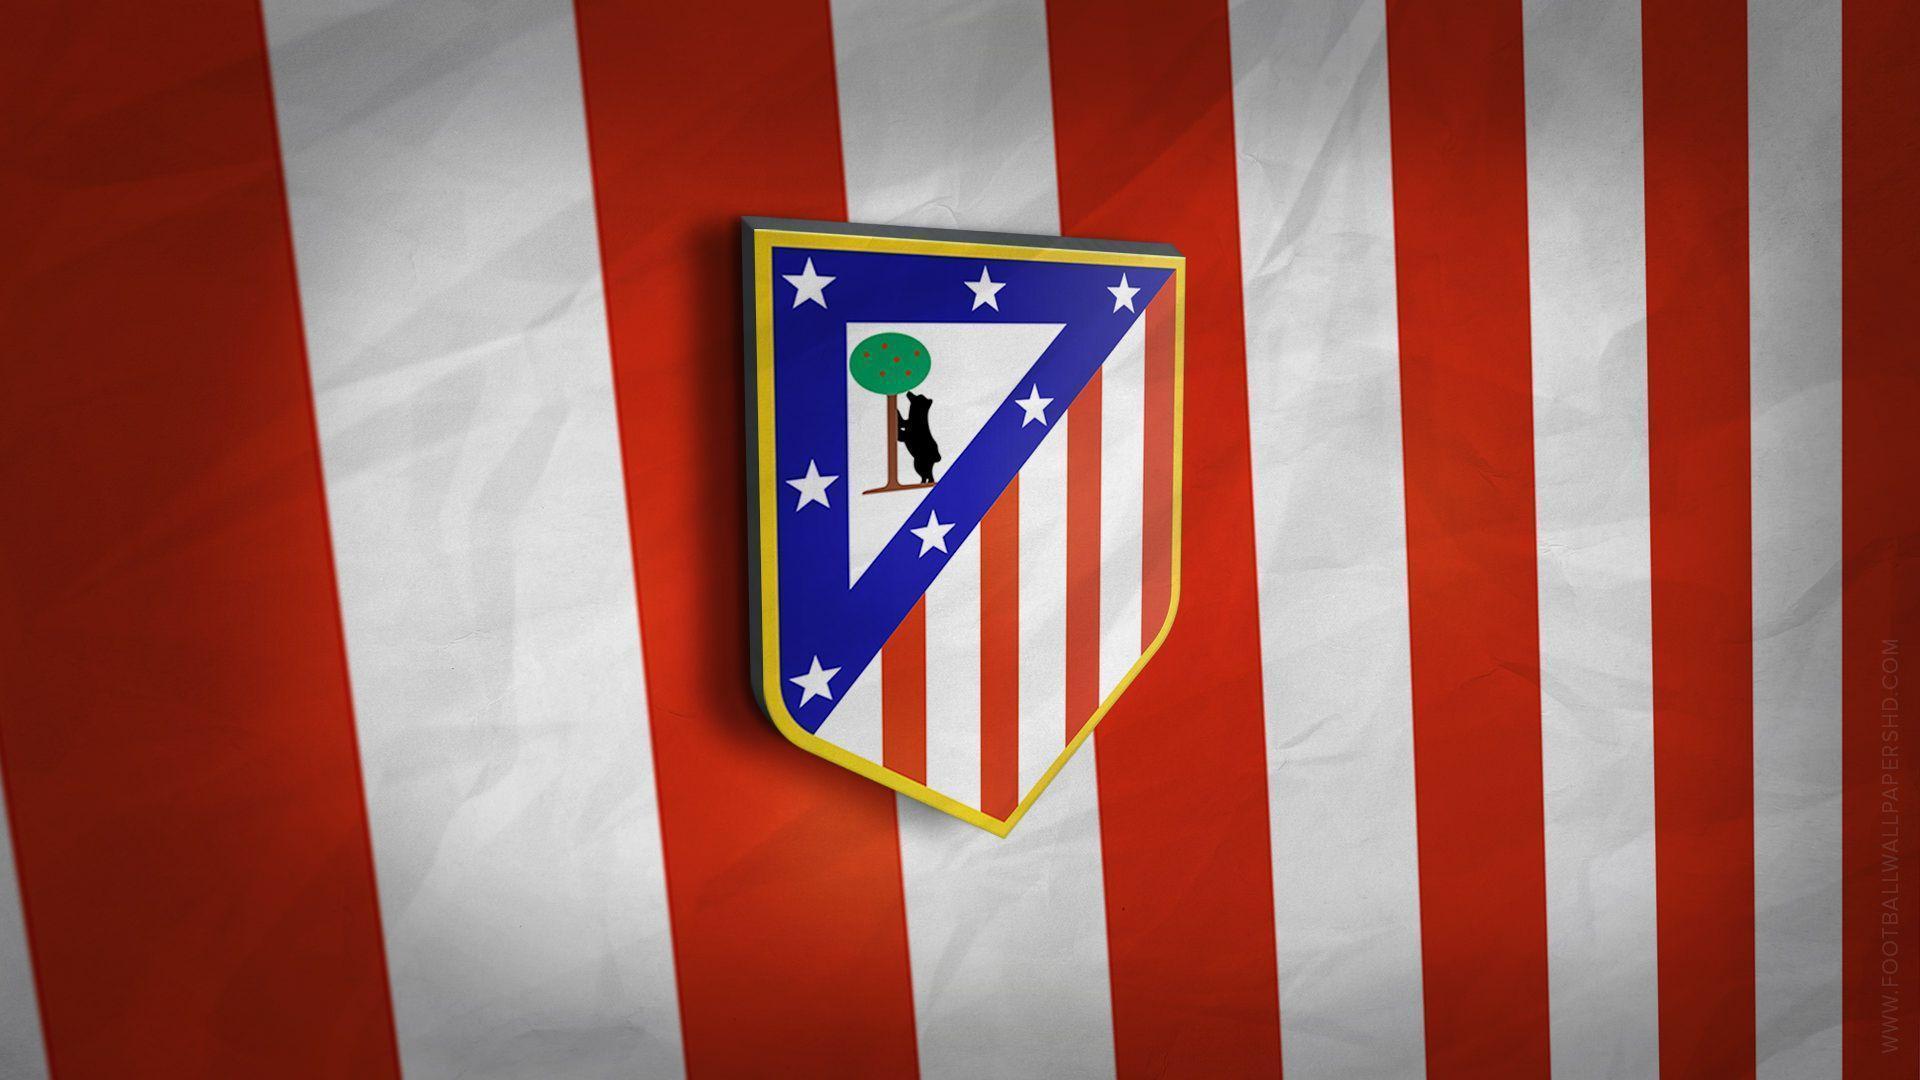 Atletico Madrid 3D Logo Wallpaper | Football Wallpapers HD ...